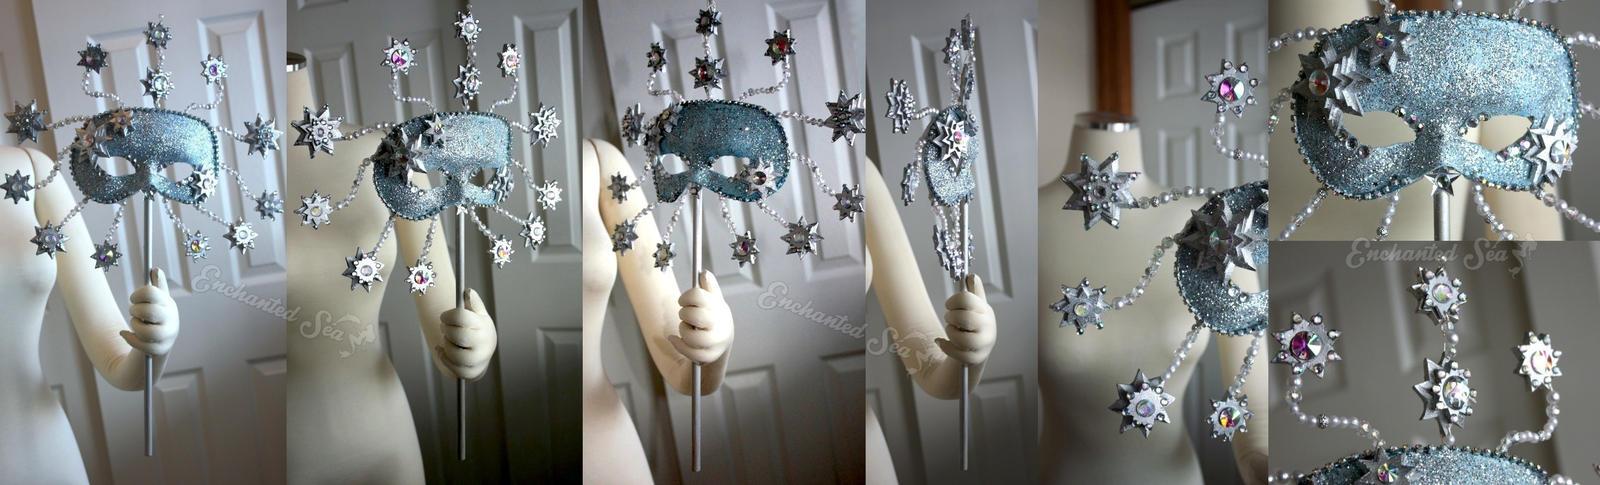 European Star Princess Mask by enchantedsea